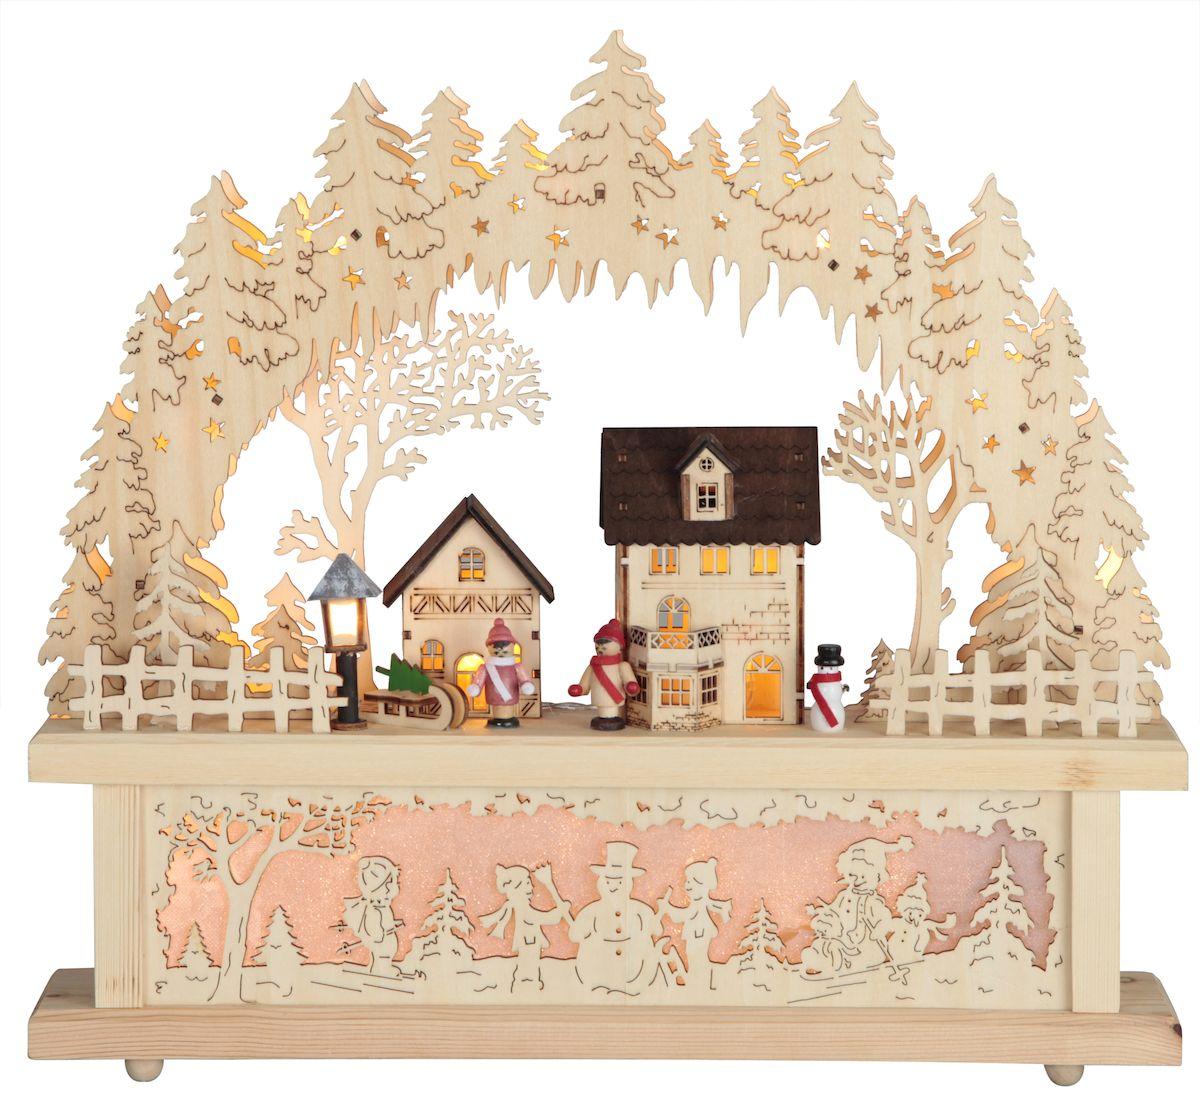 Декорация рождественская Star Trading Деревня, цвет: коричневый. 270-56270-56Декорация рождественская ДЕРЕВНЯ, 15 LED ламп, выс/шир 40х43 см, провод 5 м